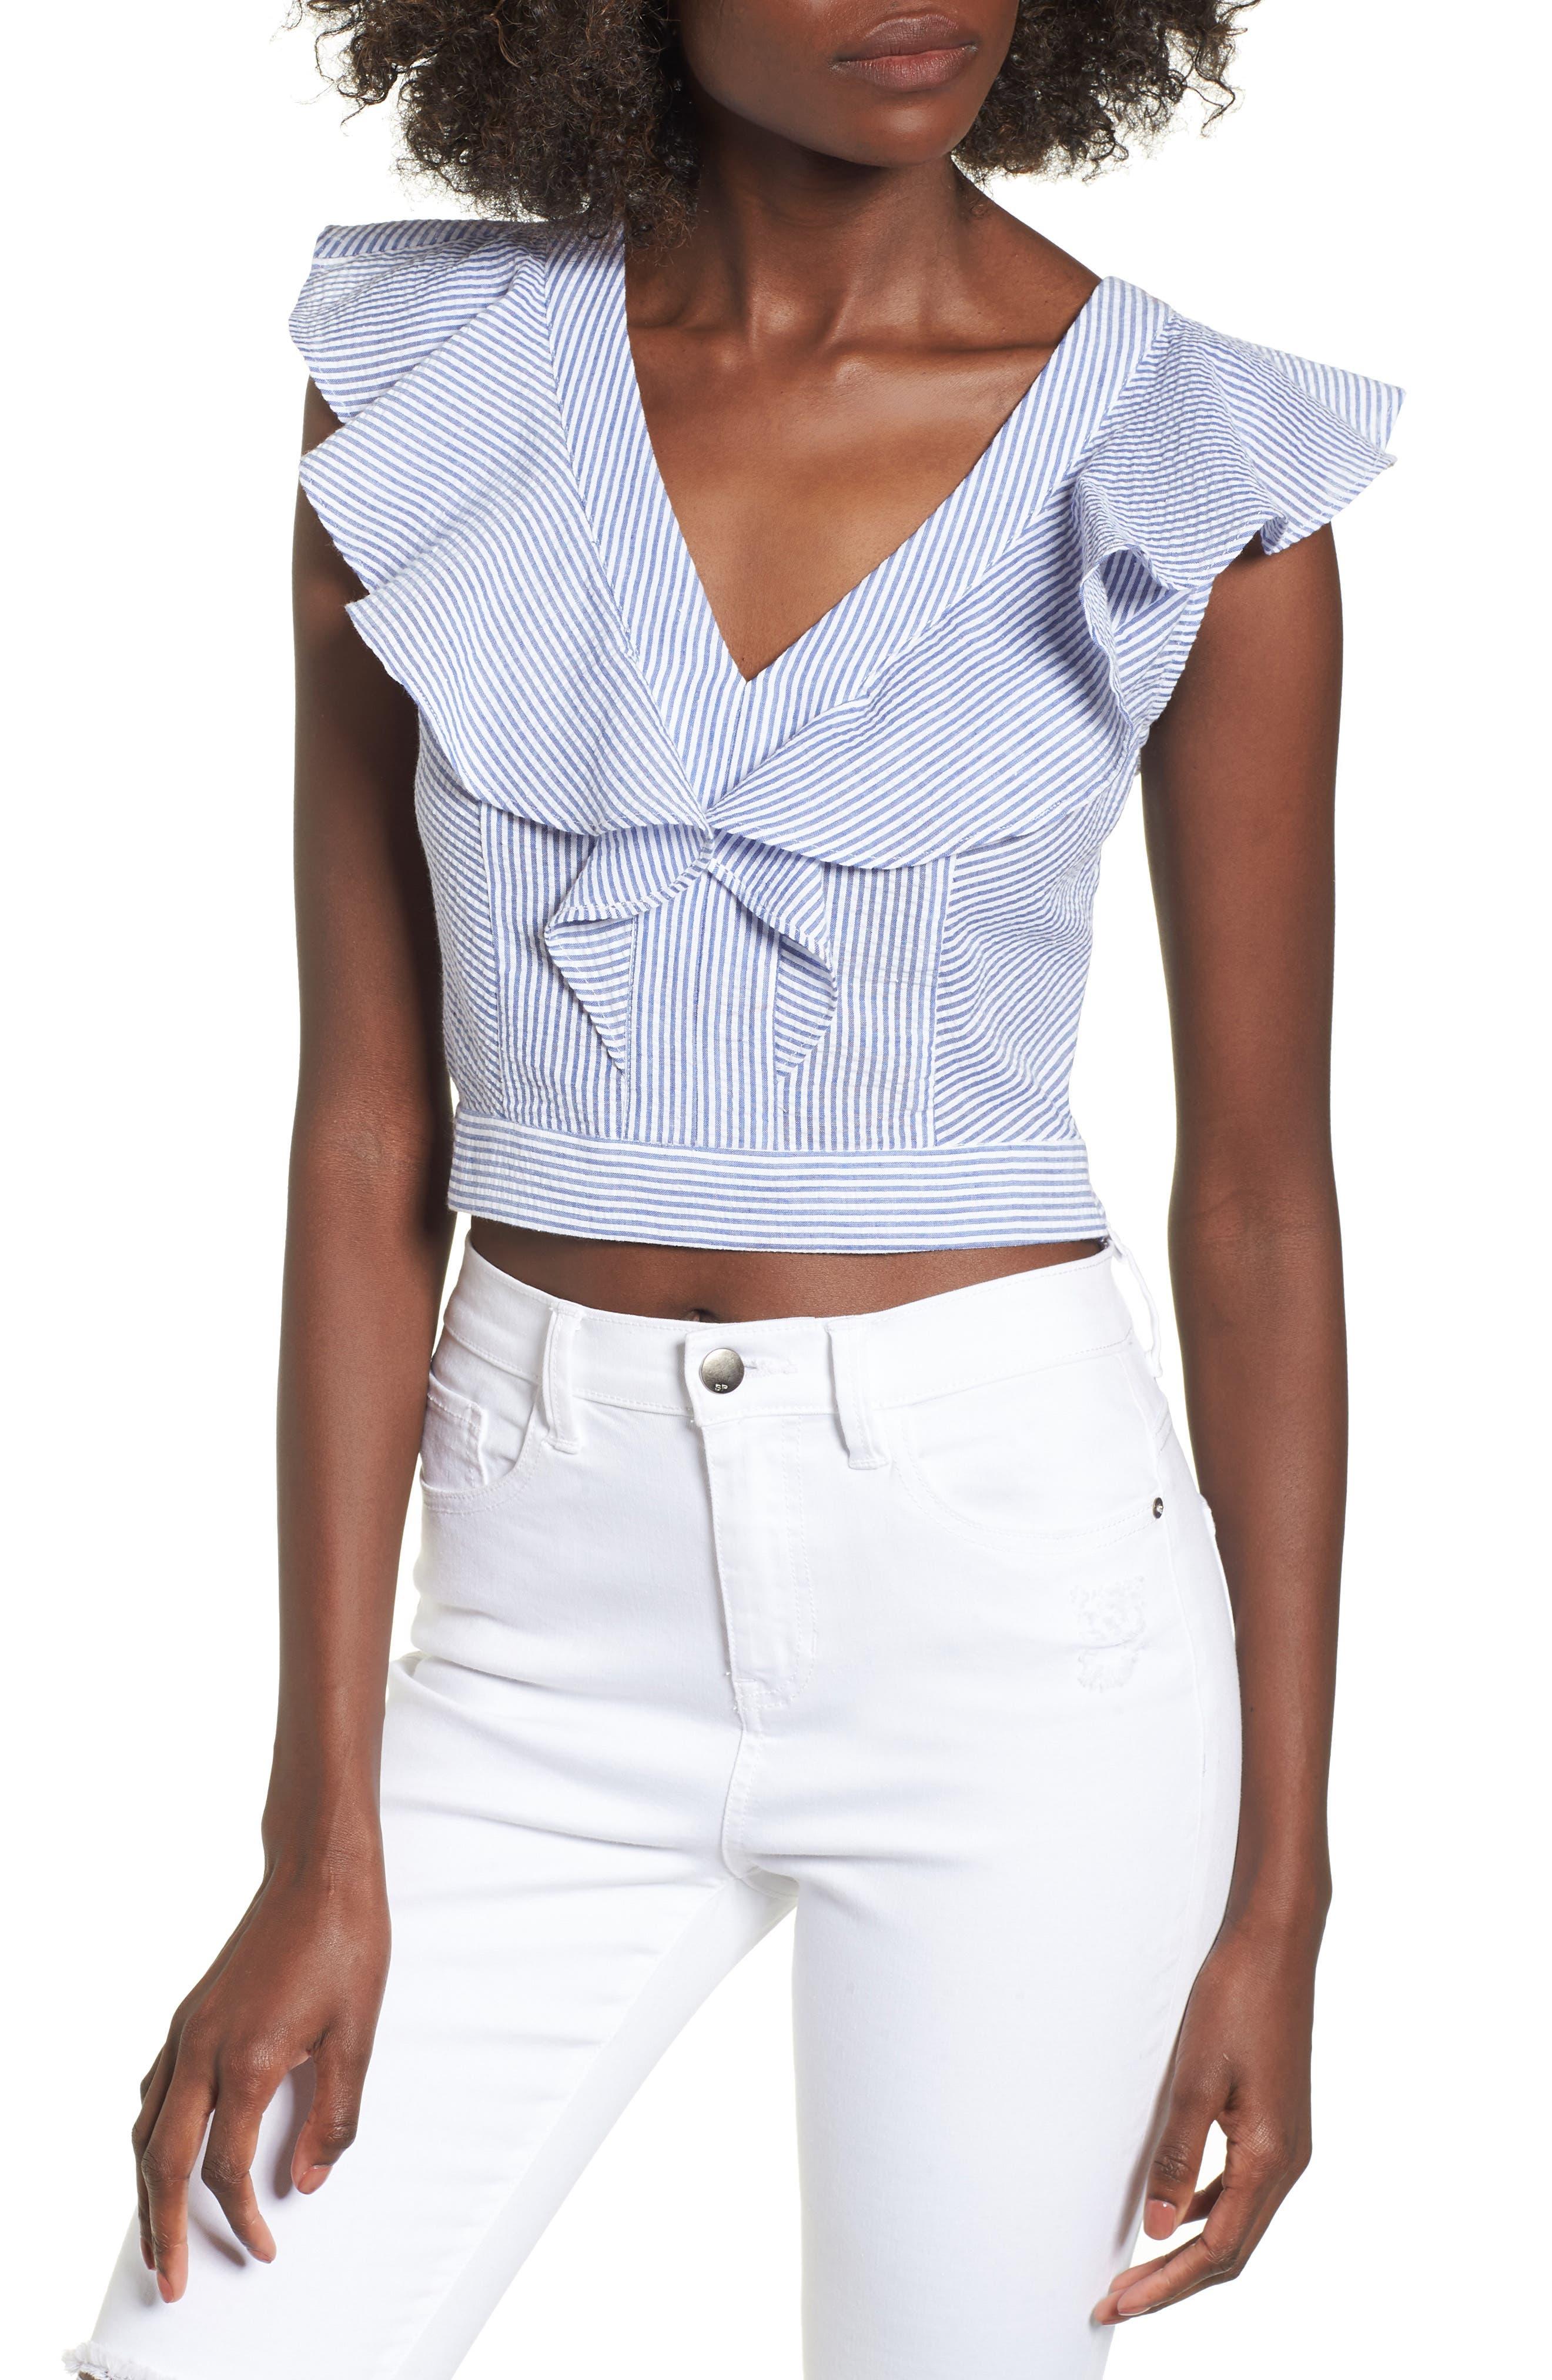 Ruffle Seersucker Crop Top,                         Main,                         color, Indigo/ White Pucker Stripe